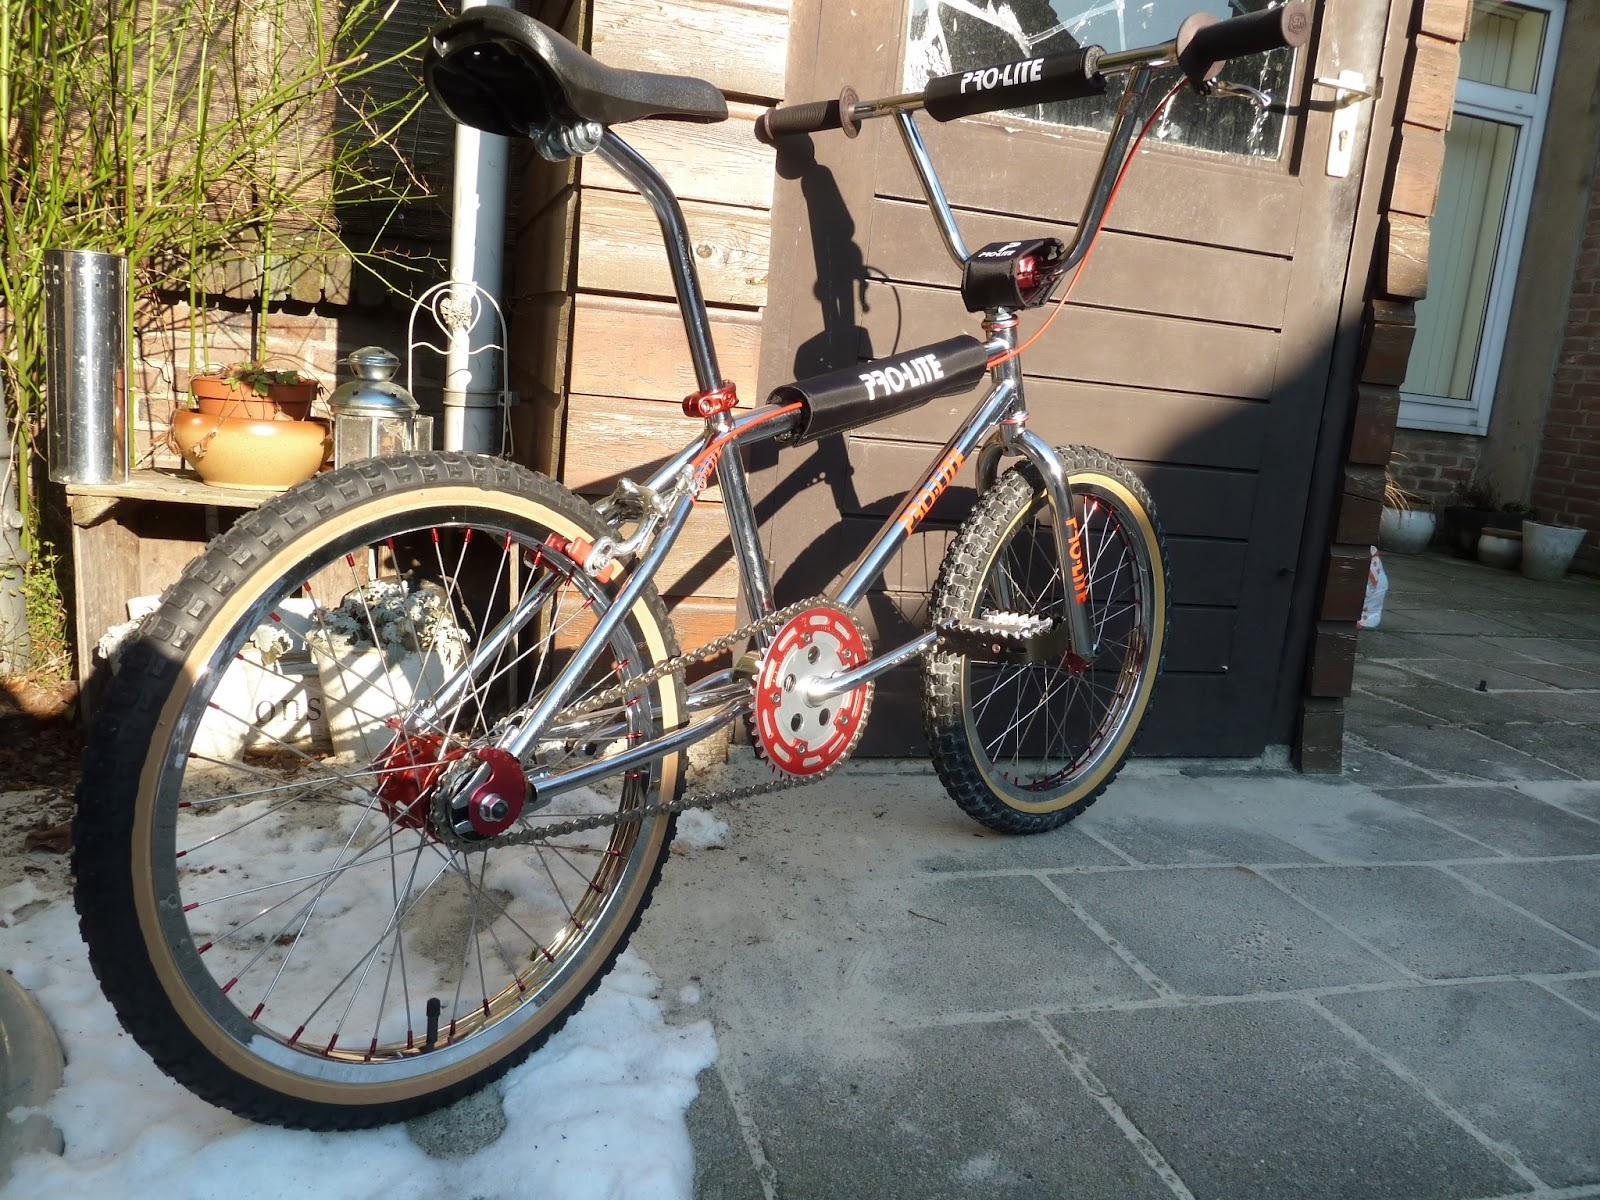 Pro Lite Bmx Bike From 1983 Restored By Hoodlum Society